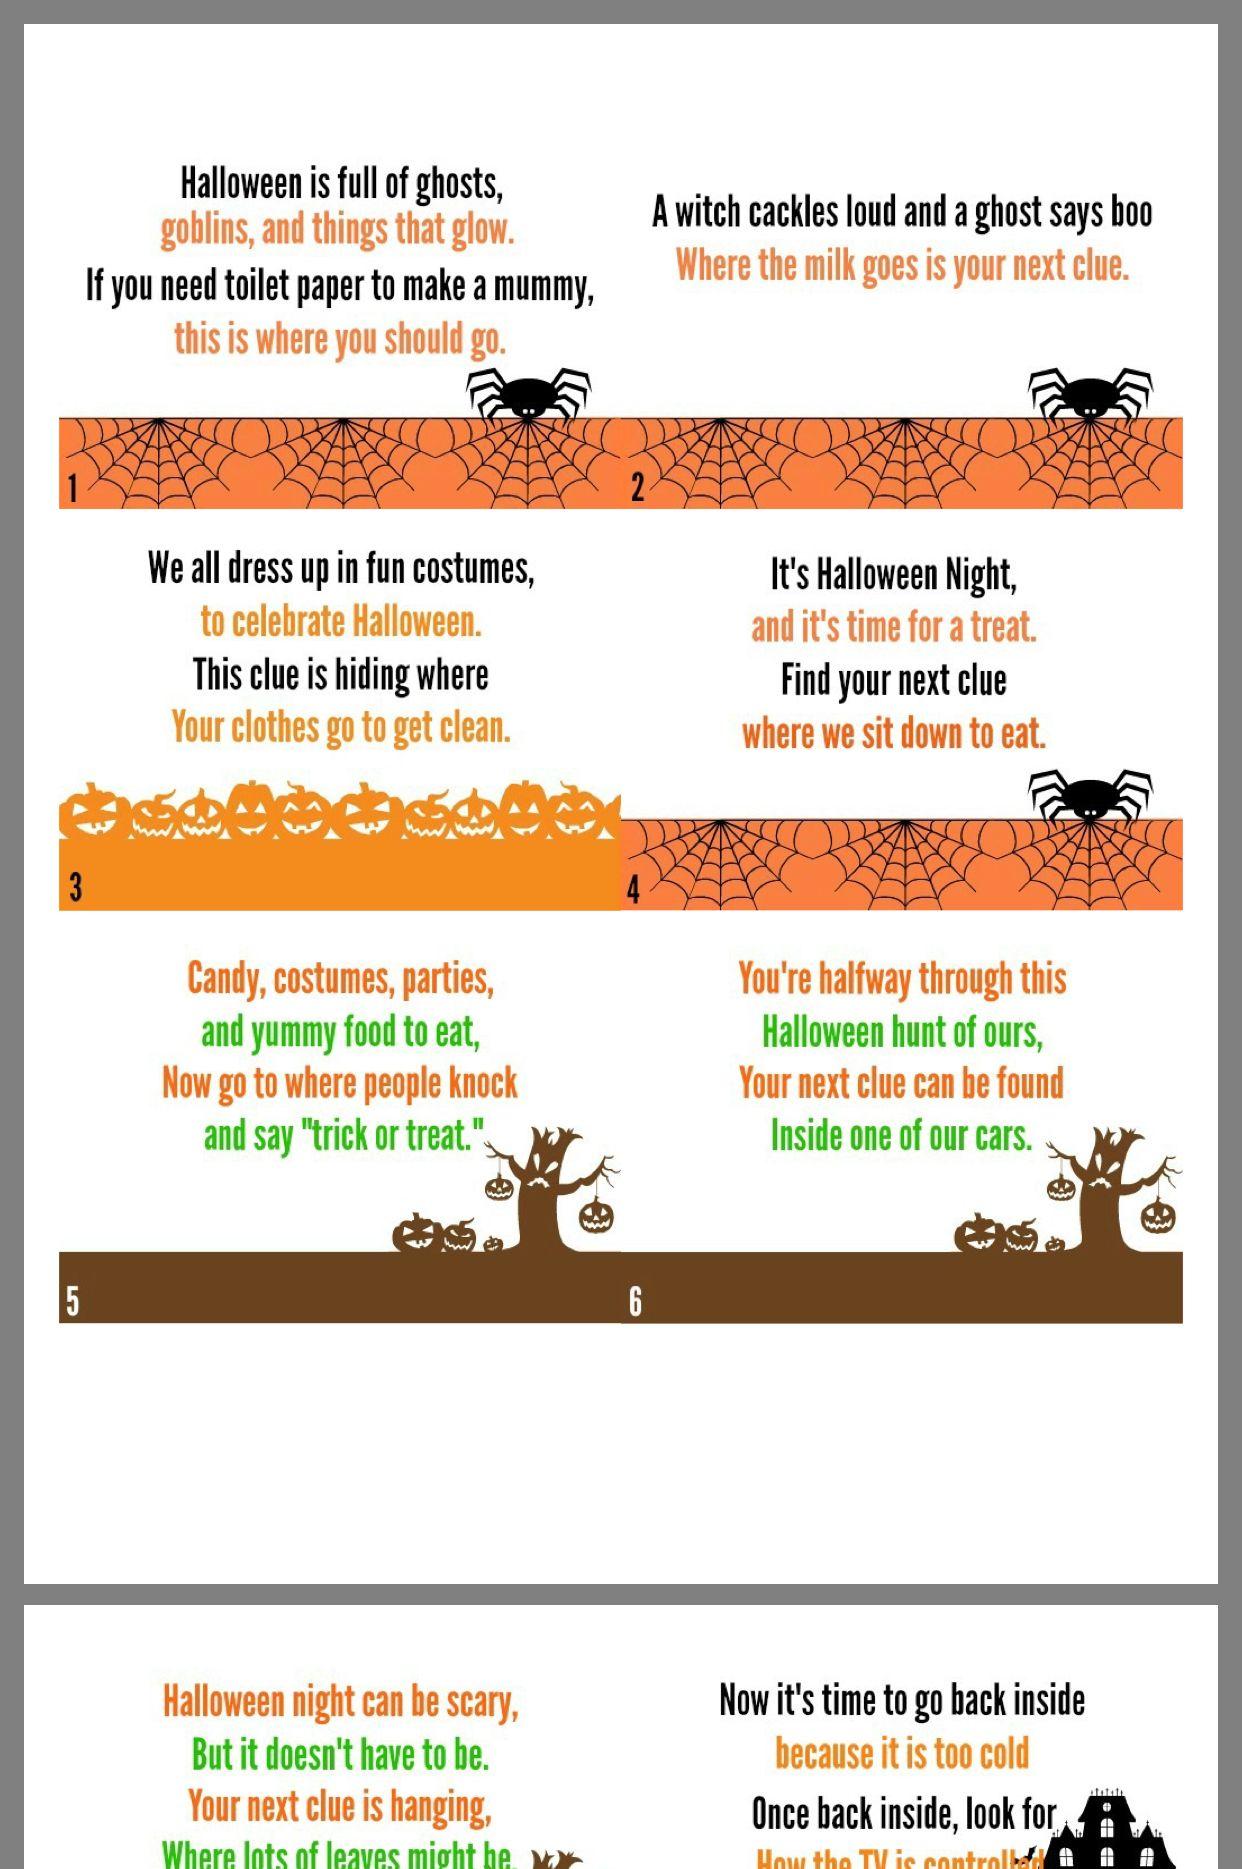 Scavenger hunt Halloween scavenger hunt, Scavenger hunt